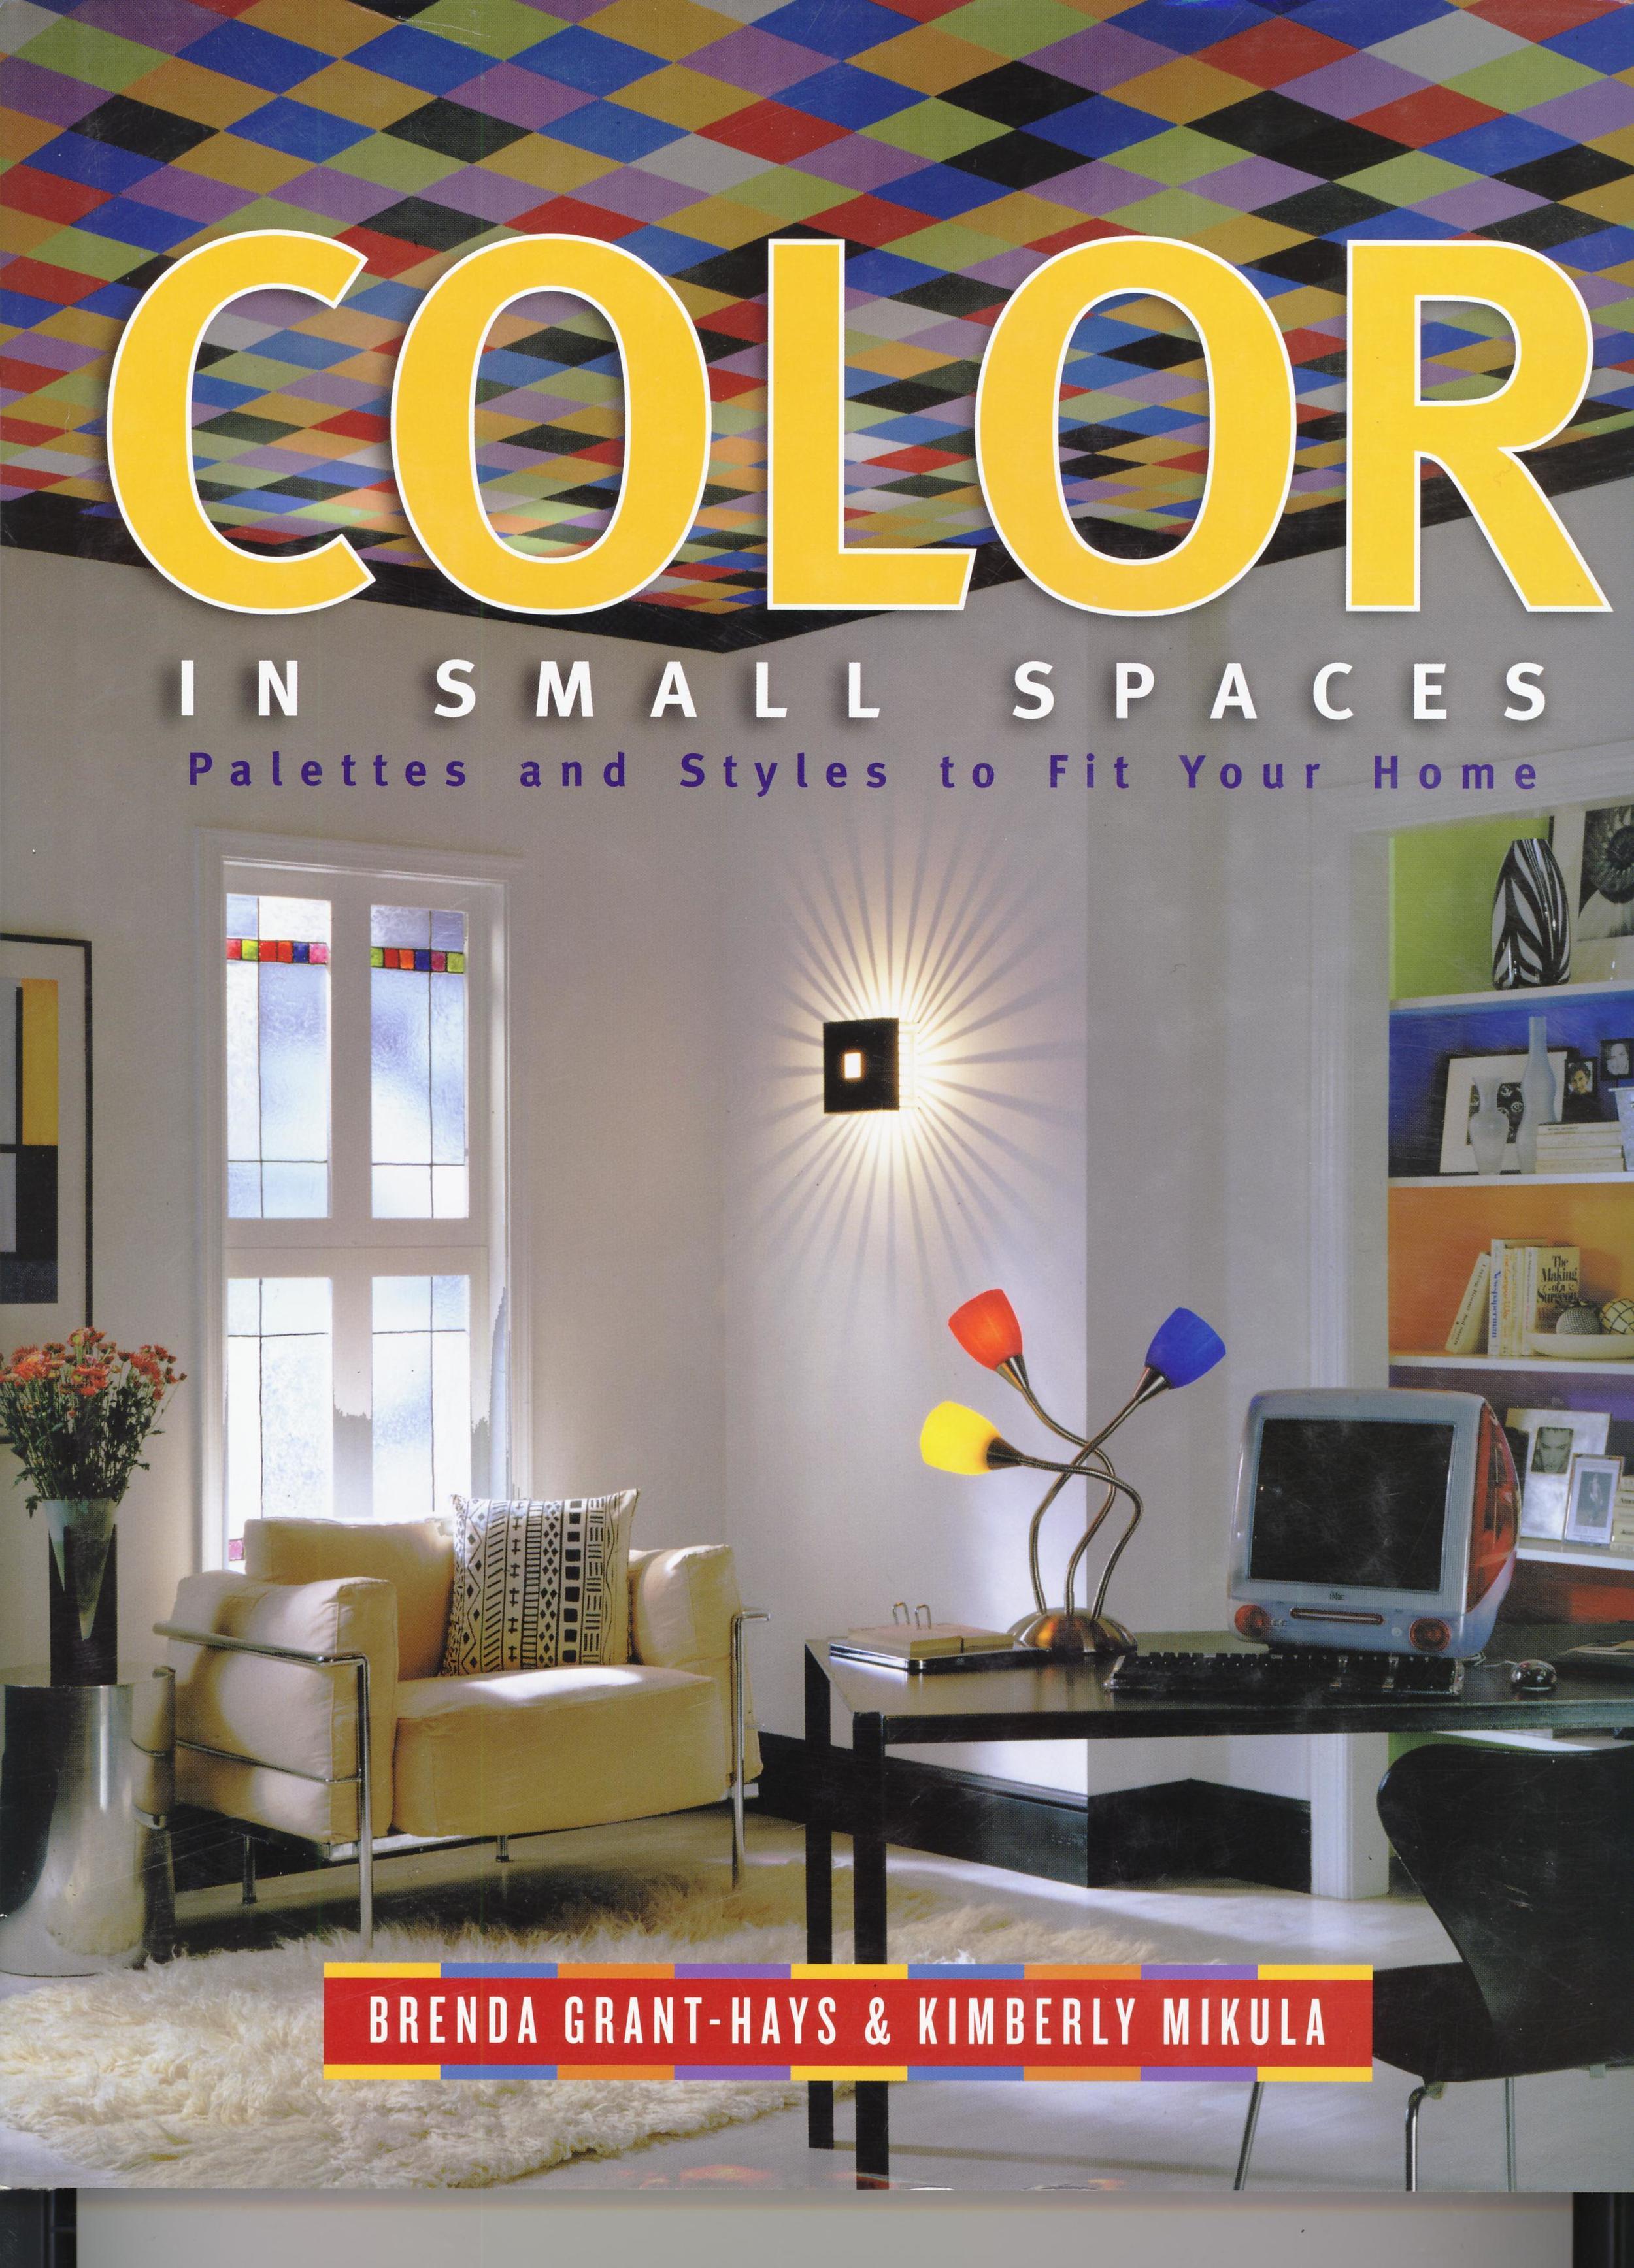 colorinsmspaces.book0001.JPG